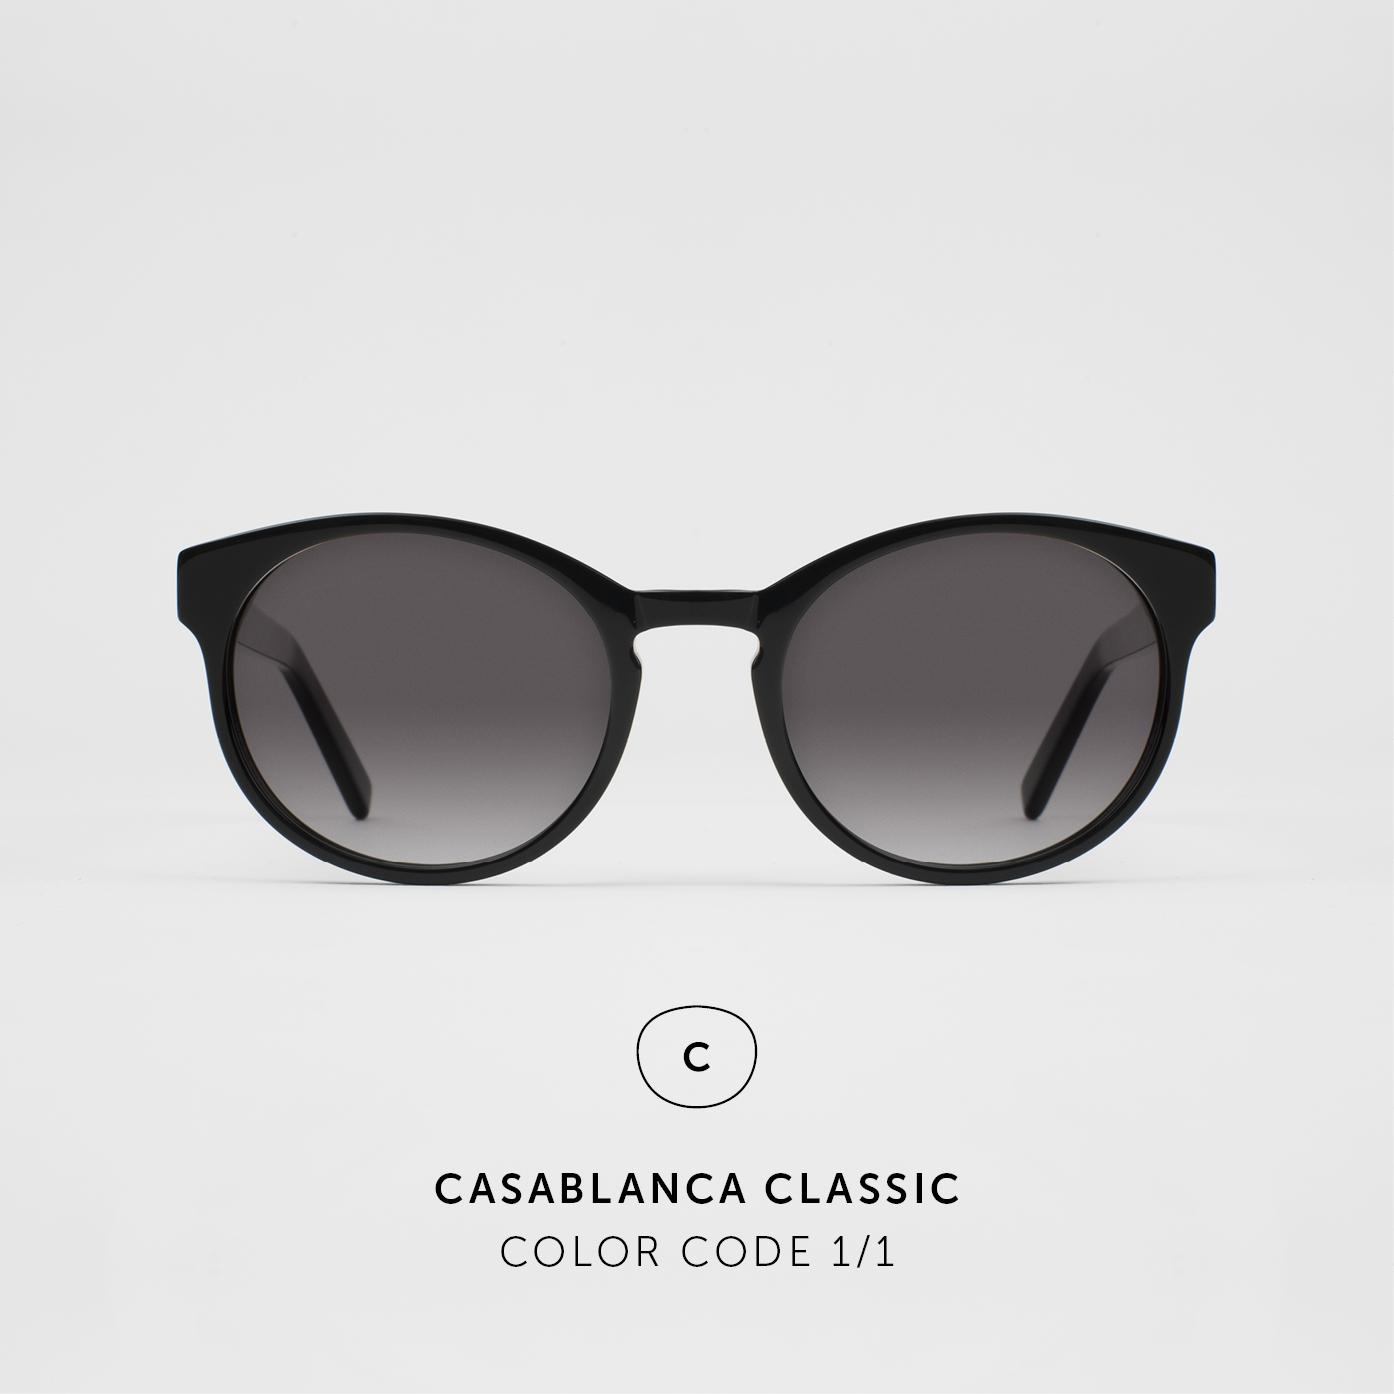 CasablancaClassic3.jpg